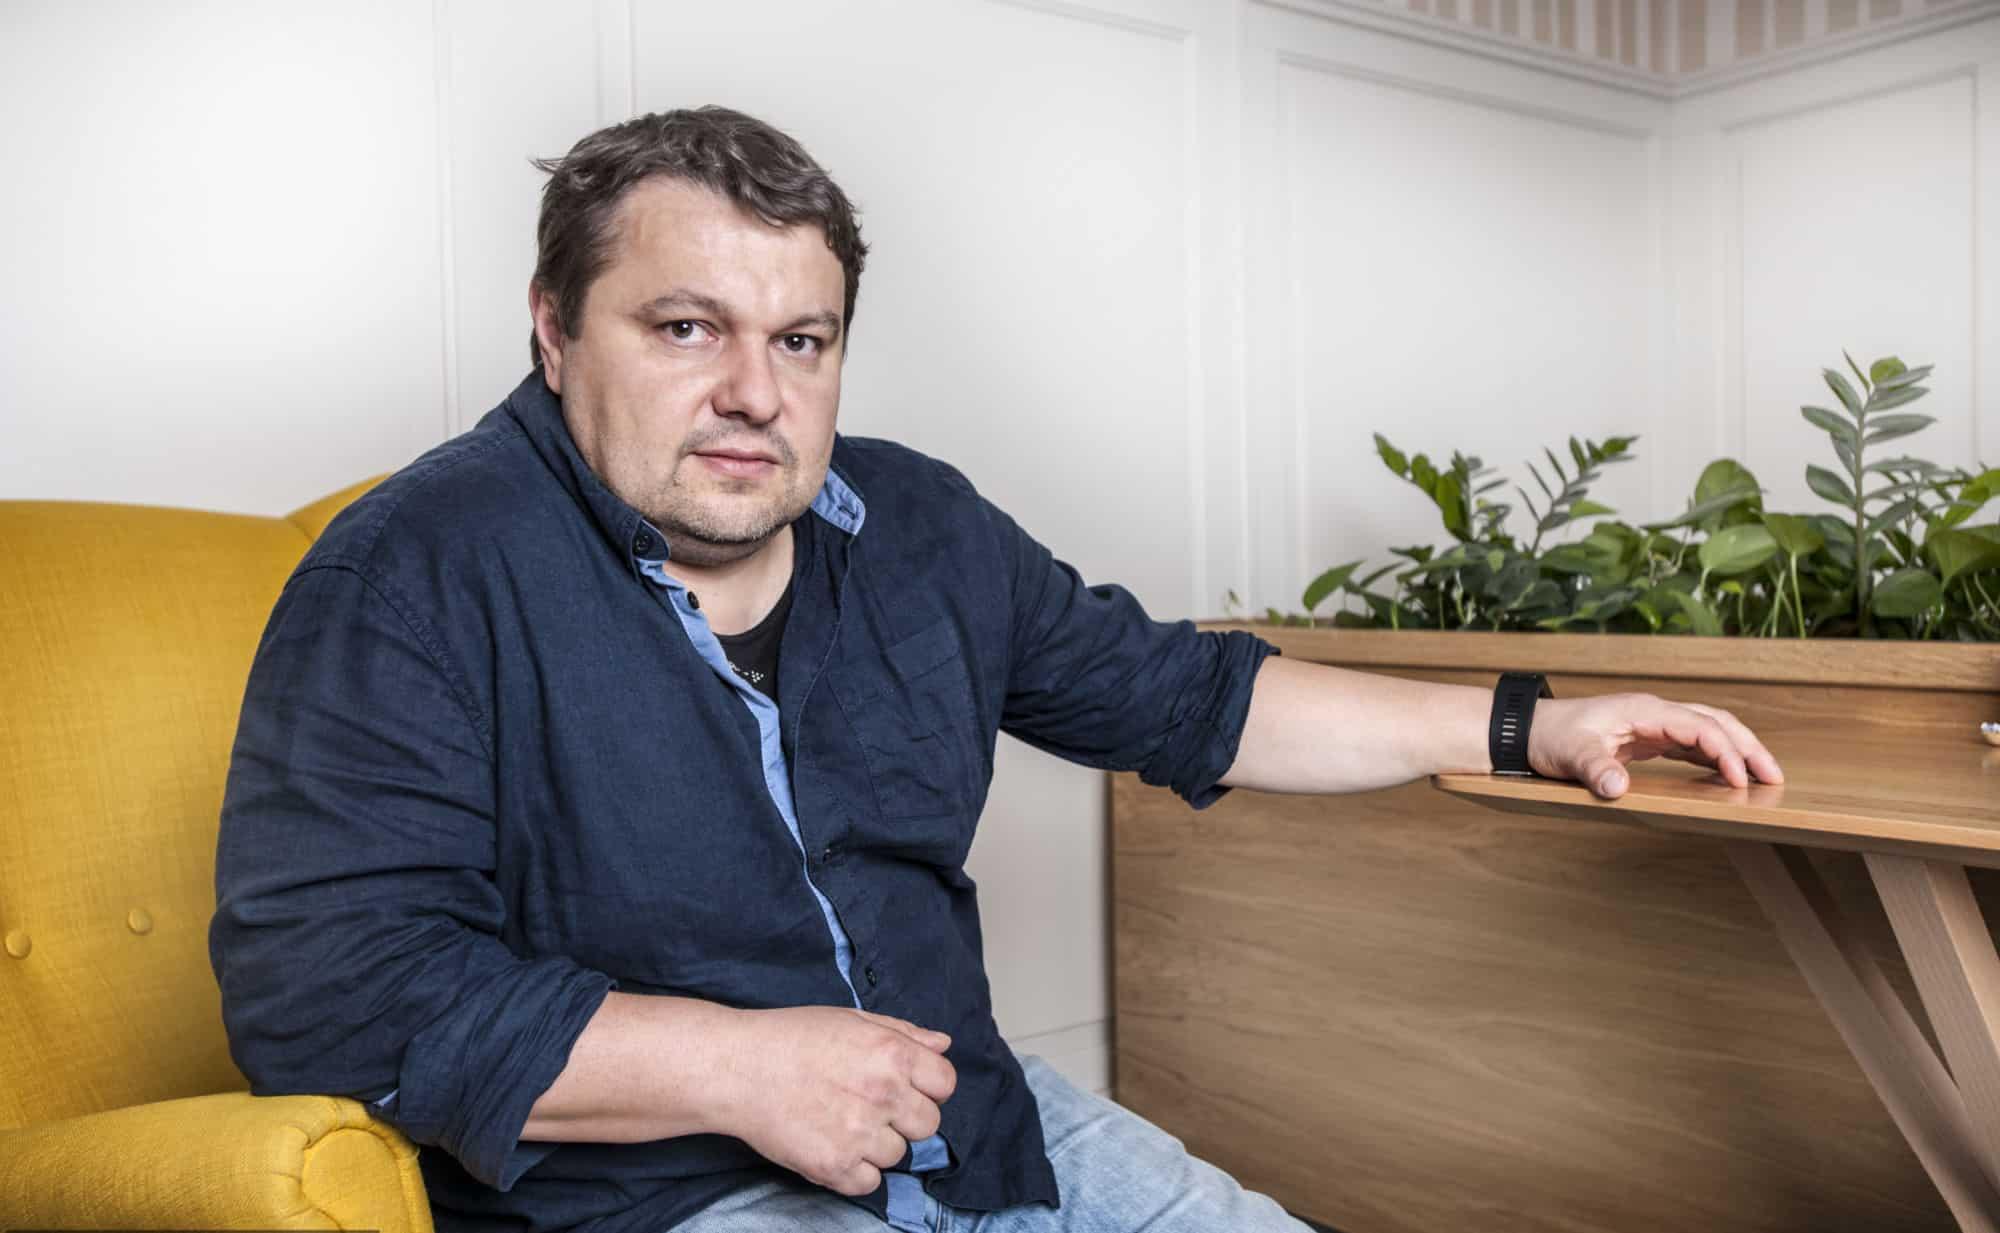 Pavel Rataj - párový terapeut Praha, párová terapie, INPAT, institut párové terapie